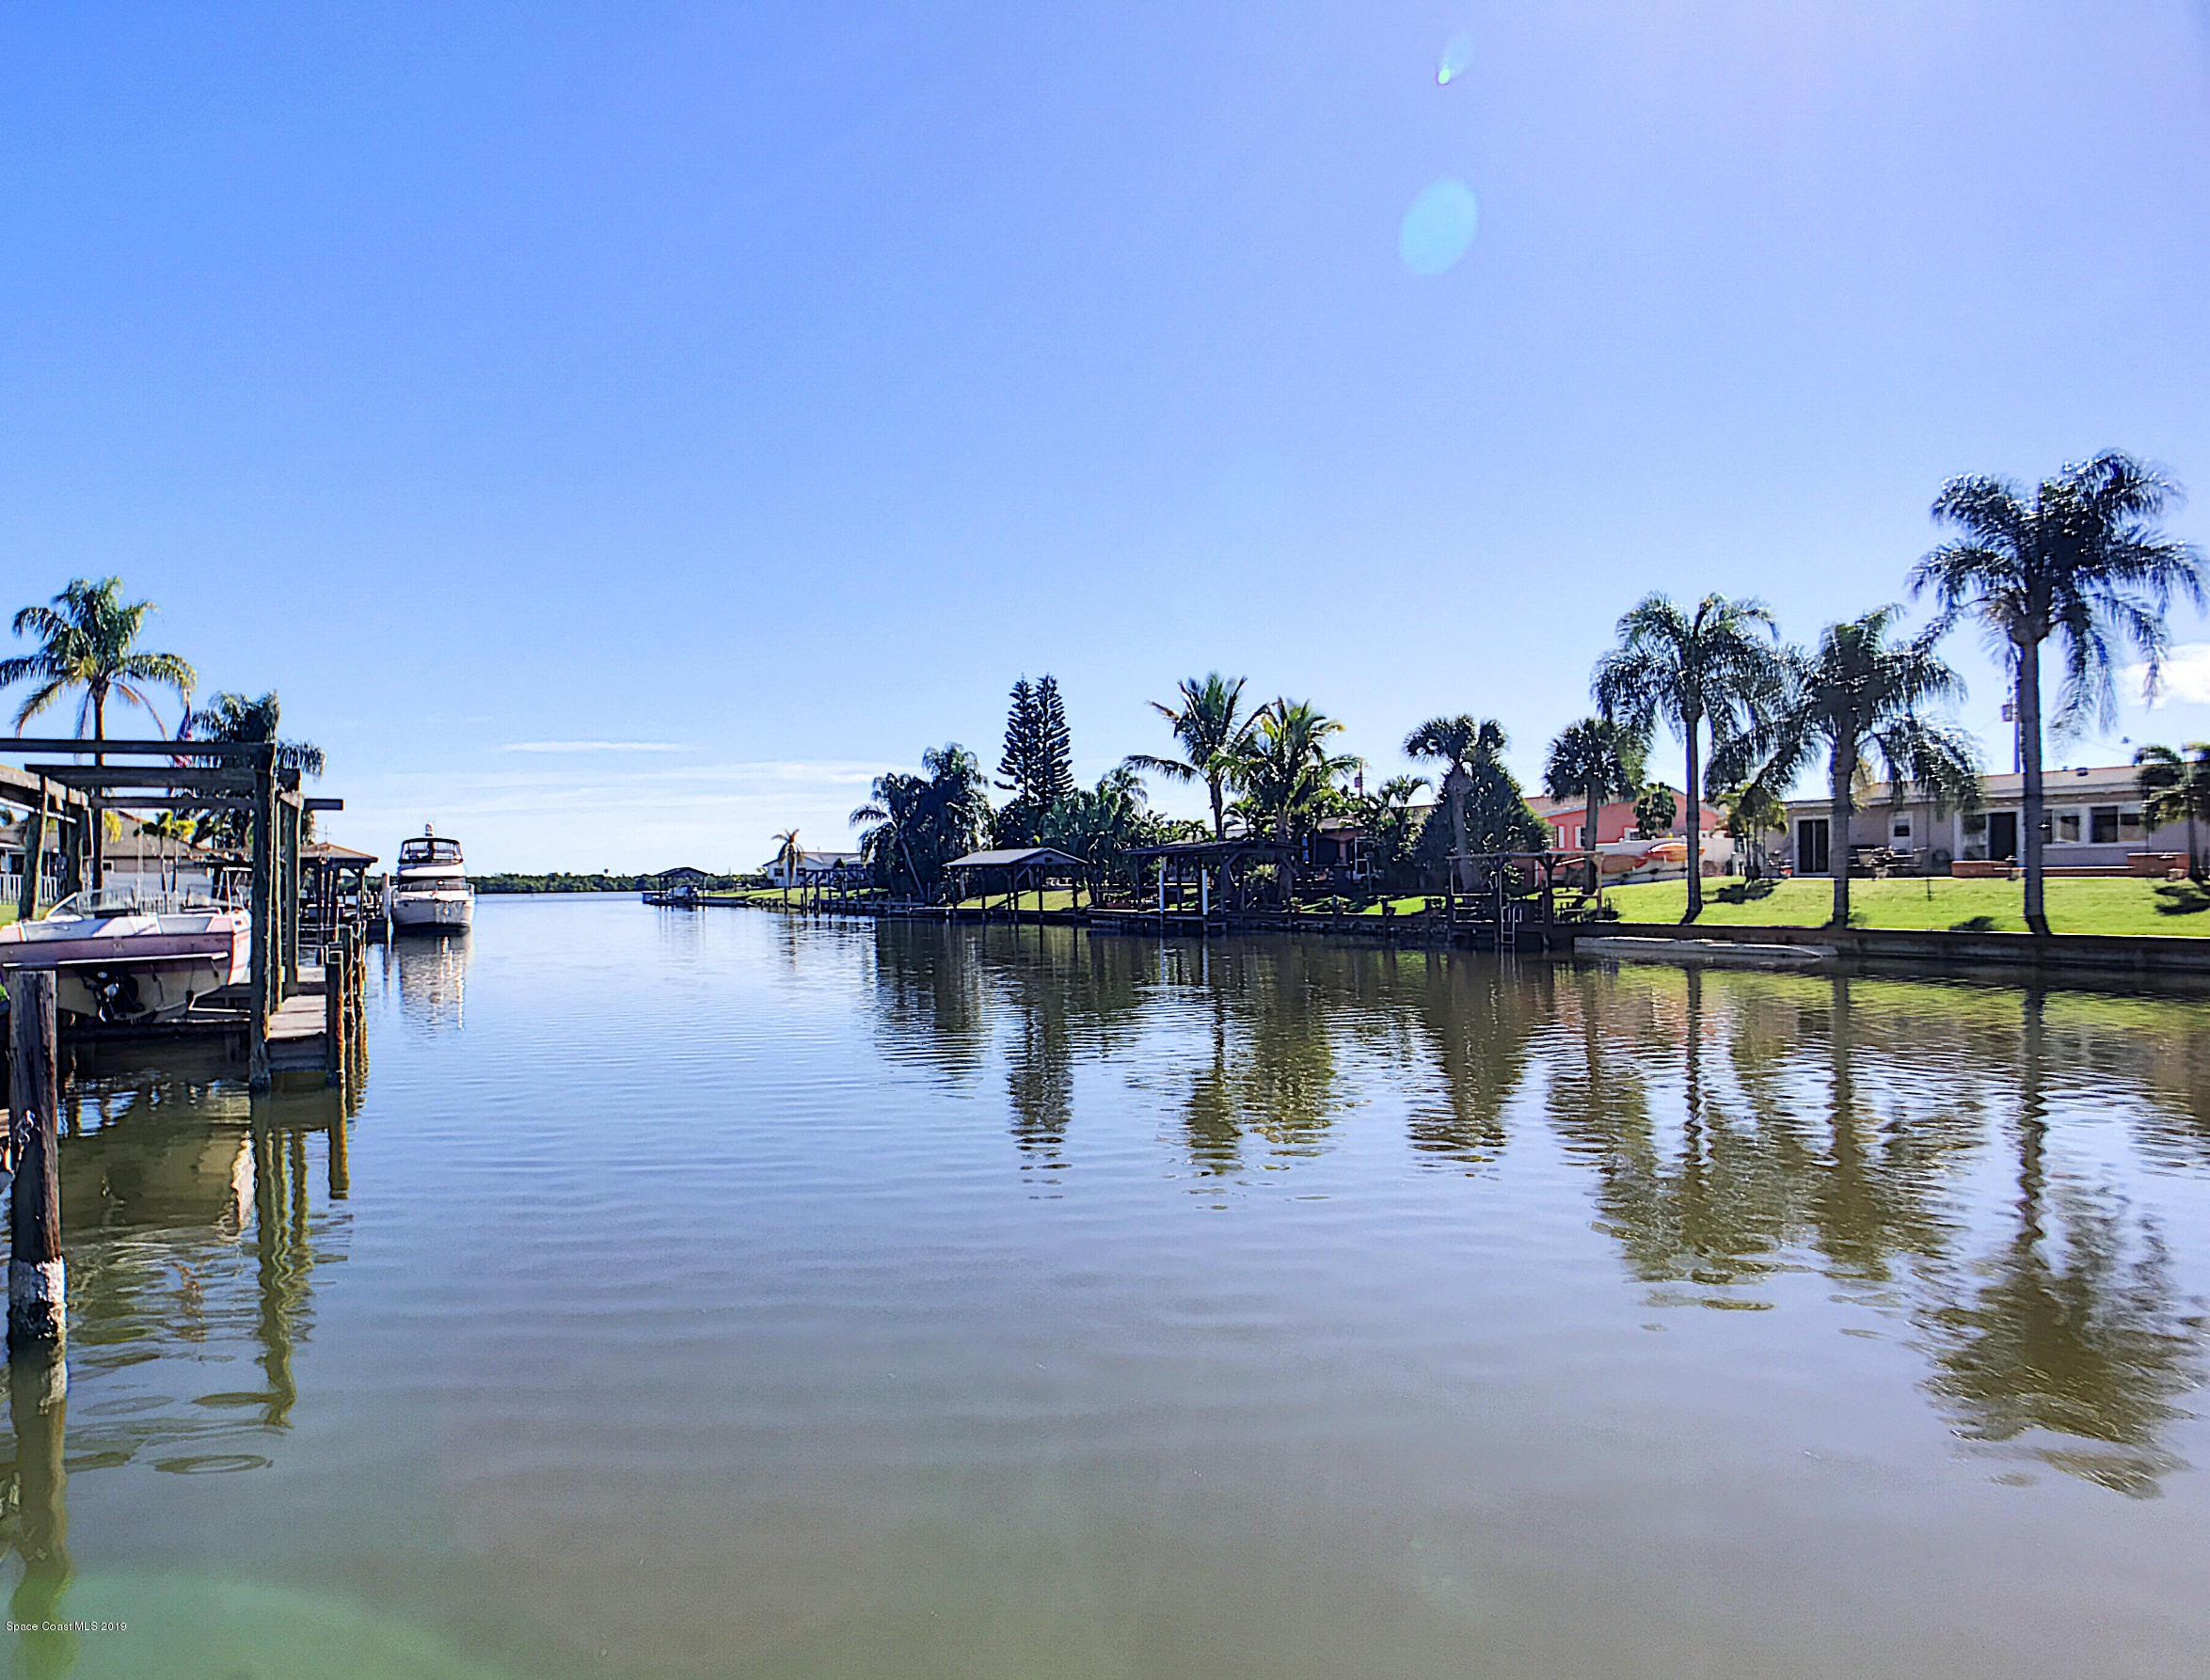 Single Family Home for Sale at 425 Sundoro 425 Sundoro Merritt Island, Florida 32953 United States